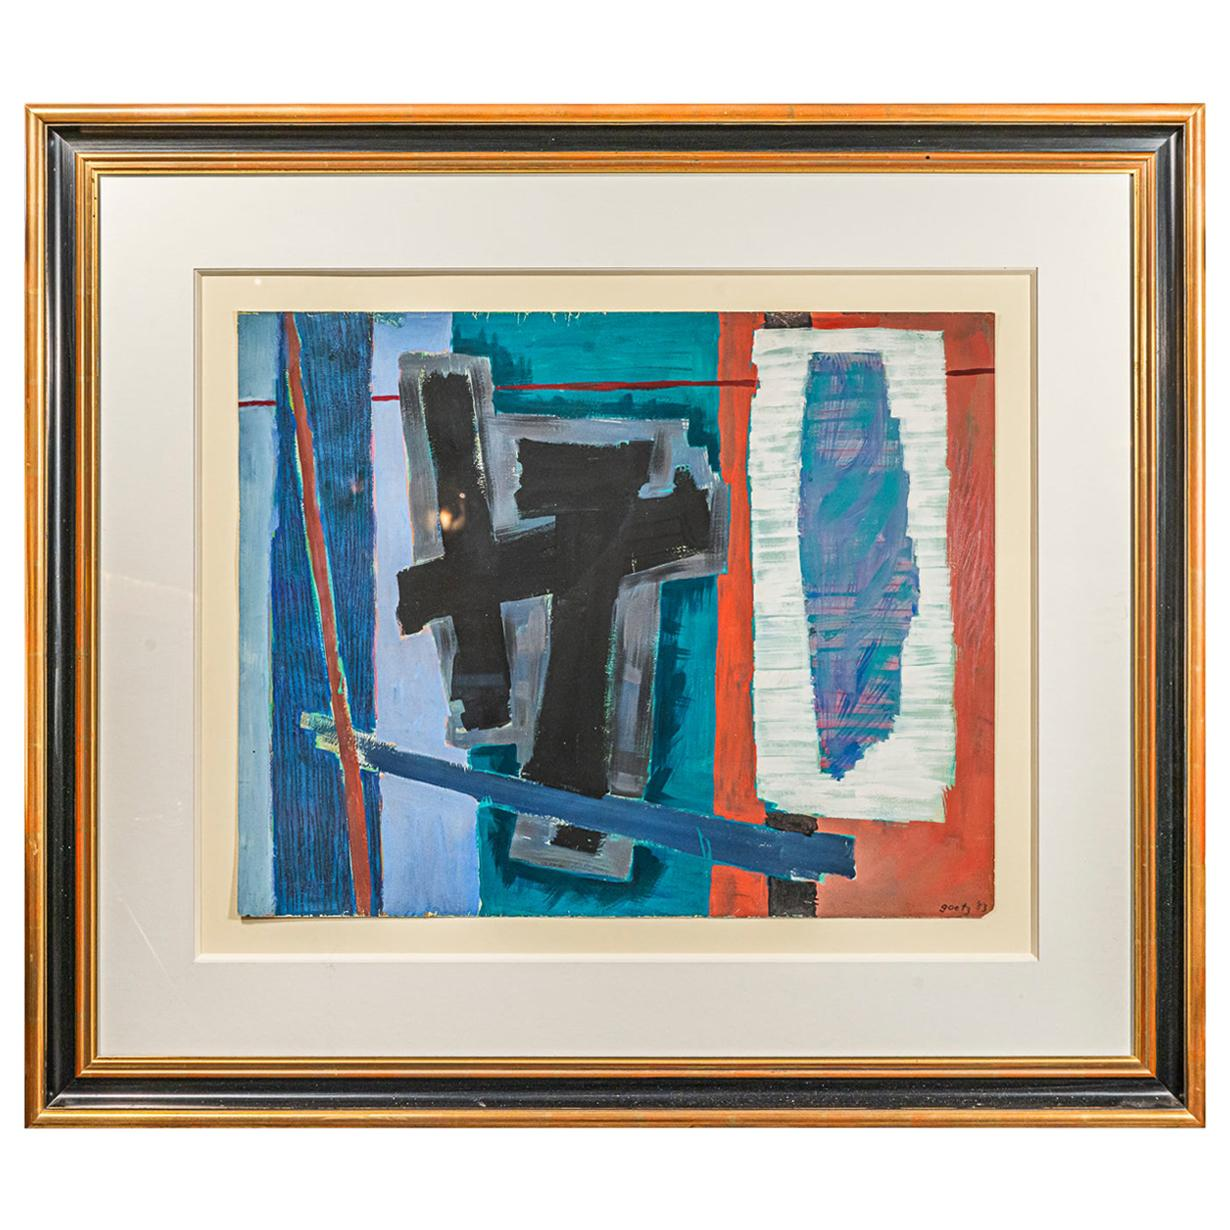 Henri Goetz, Painting, France, 1953